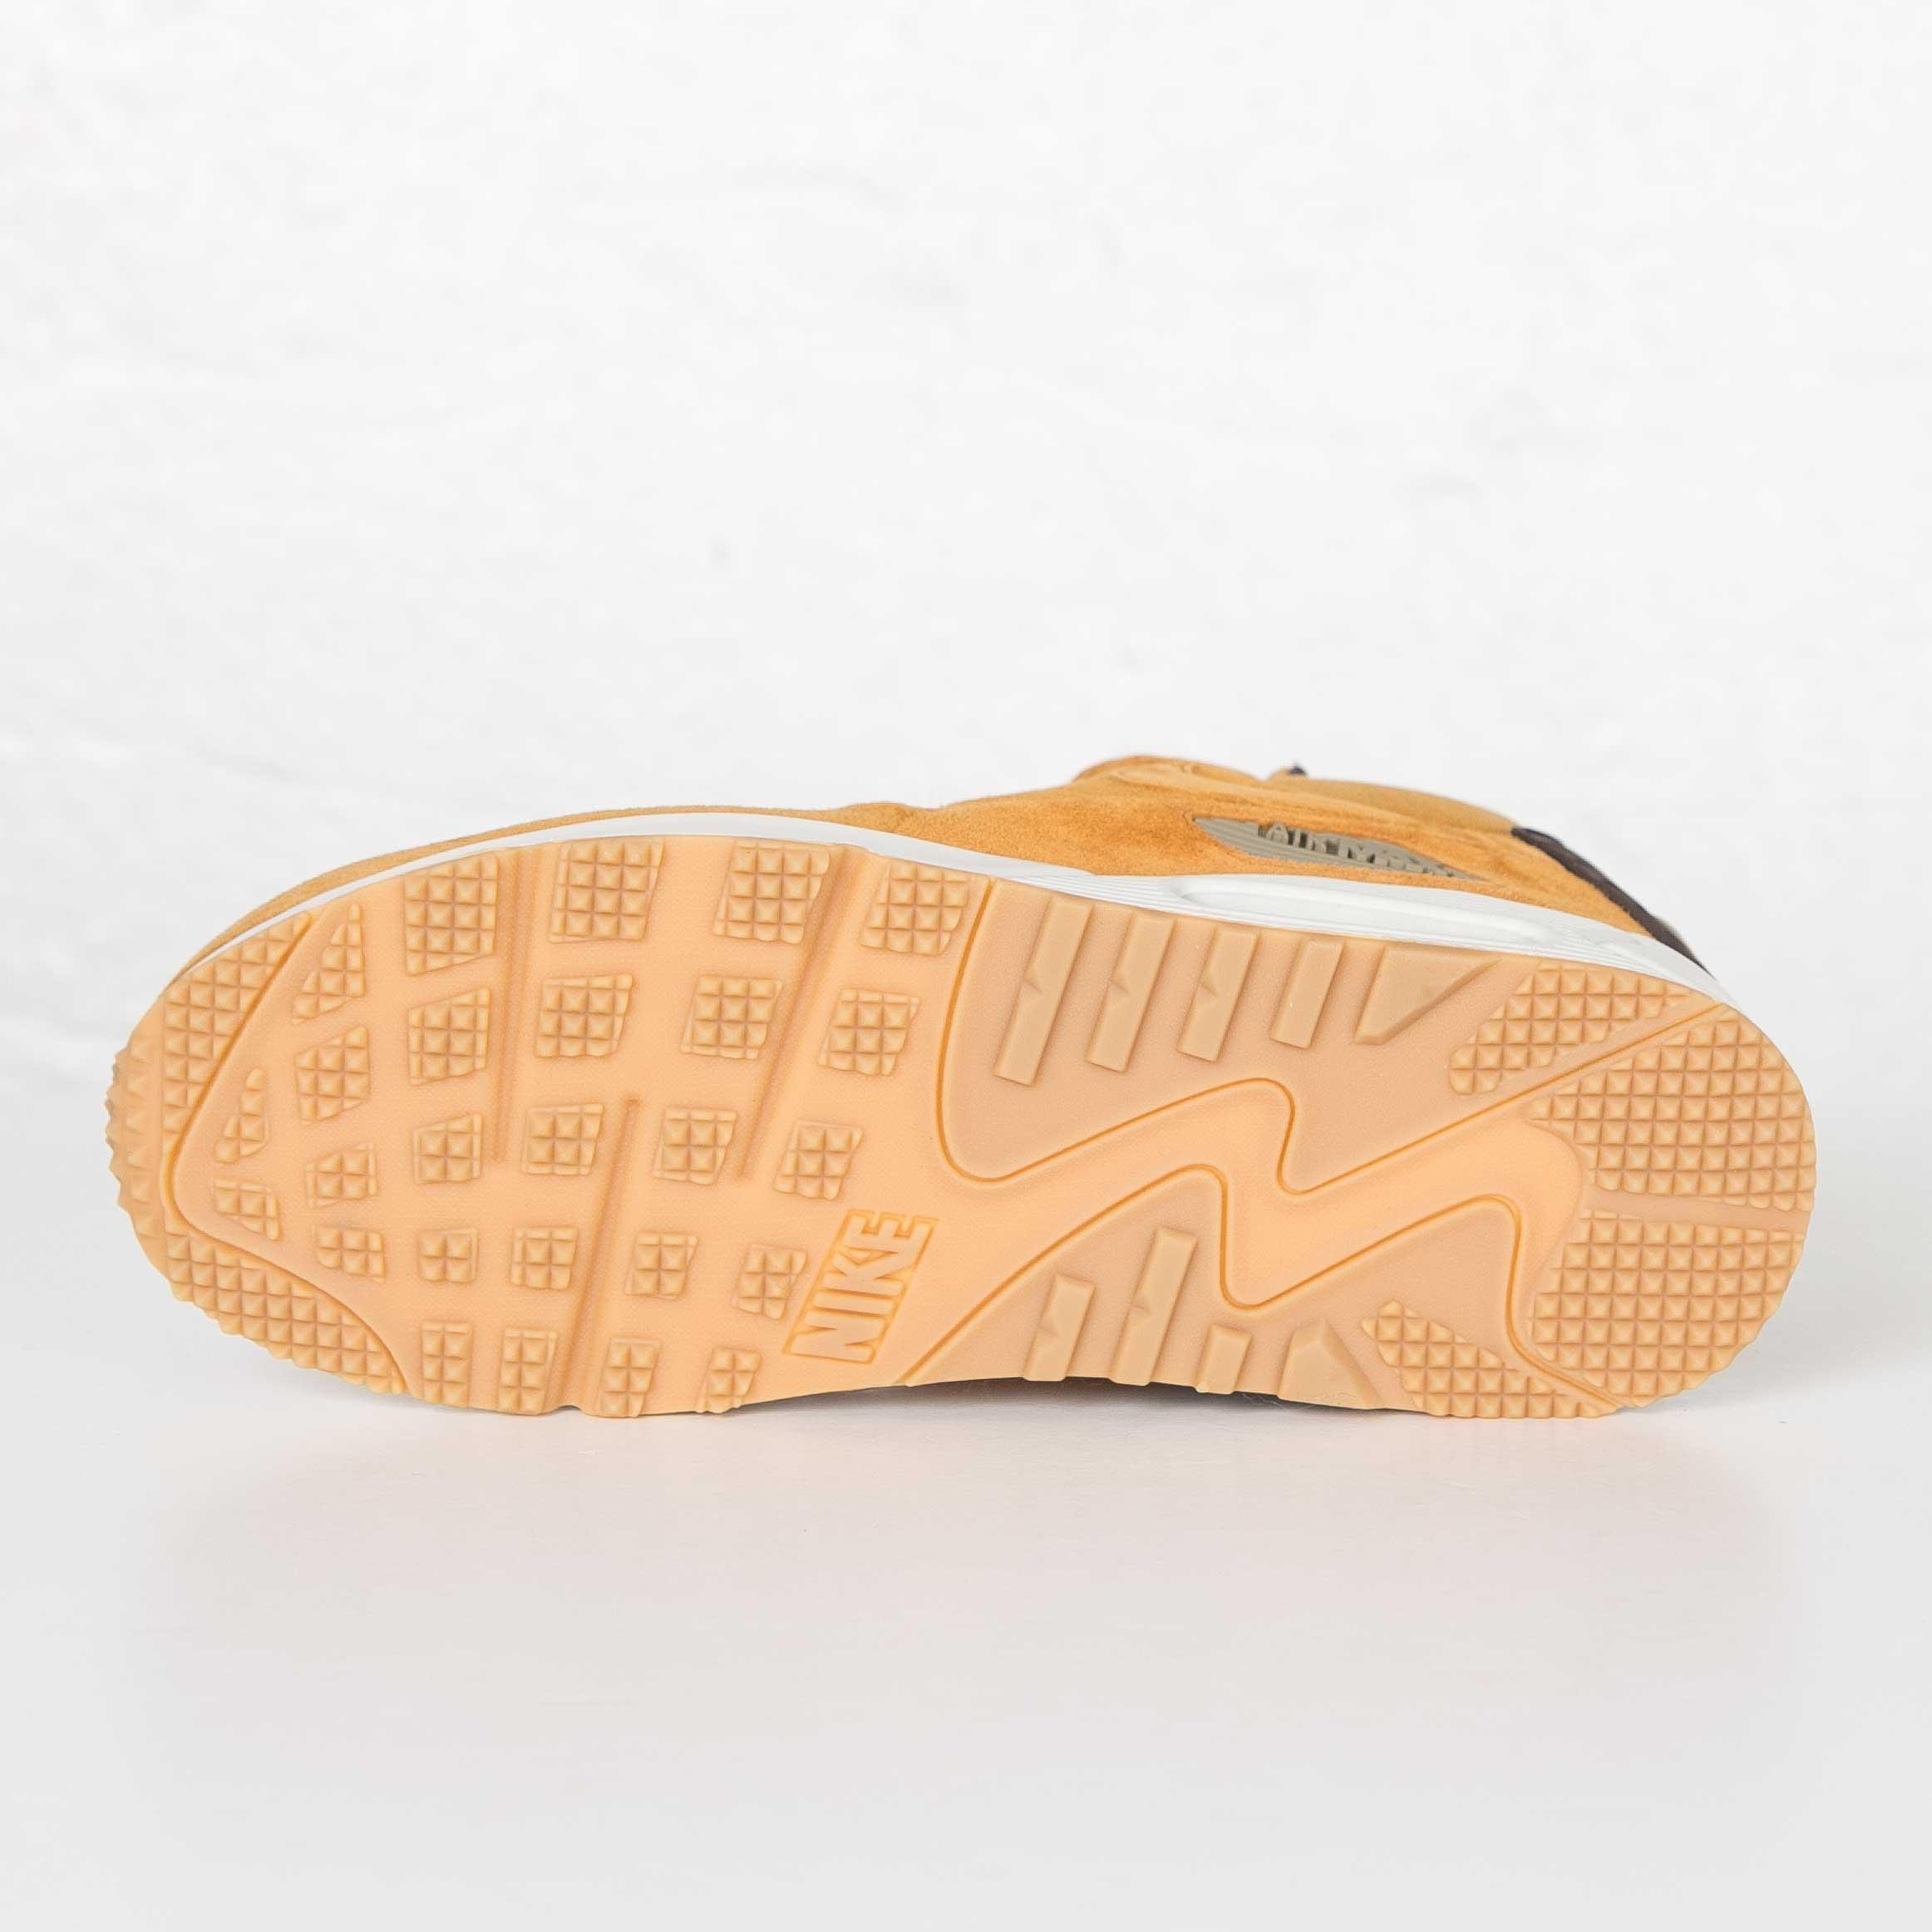 eb8e4ff597 Nike Air Max 90 Sneakerboot Winter - 684714-700 - Sneakersnstuff ...